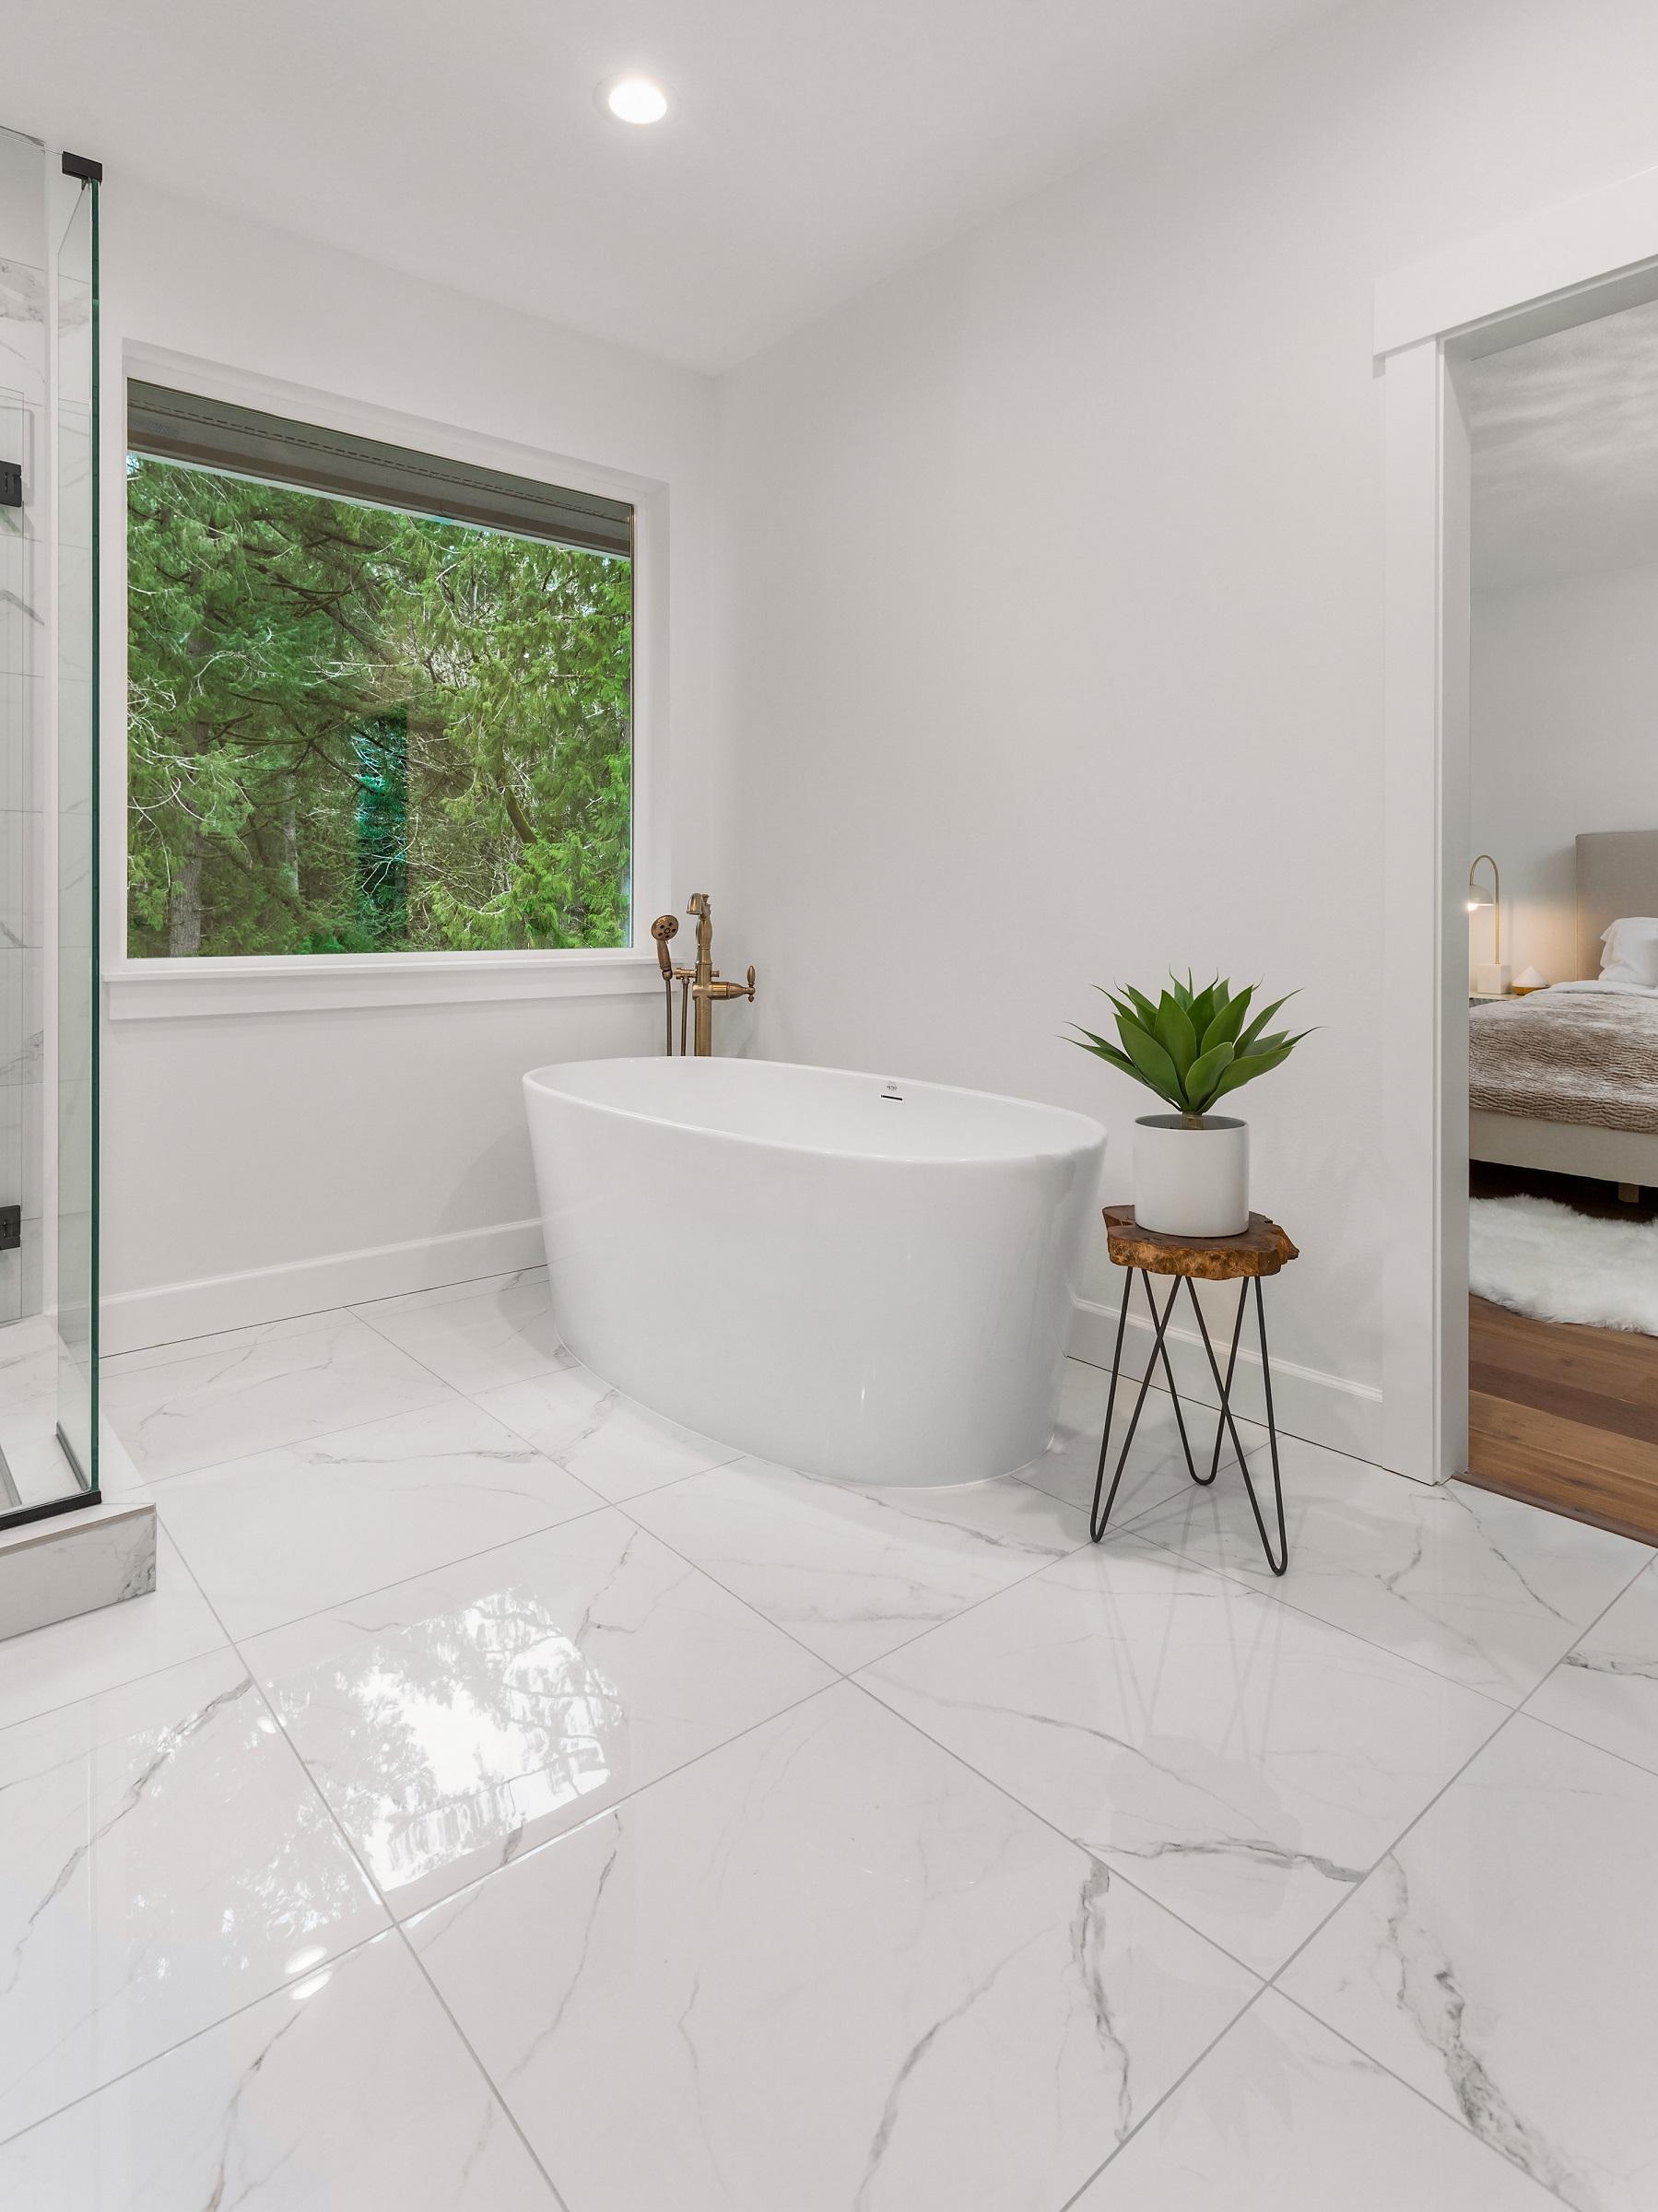 Beautiful Bathtub and Floor in Bathroom in New Luxury Home